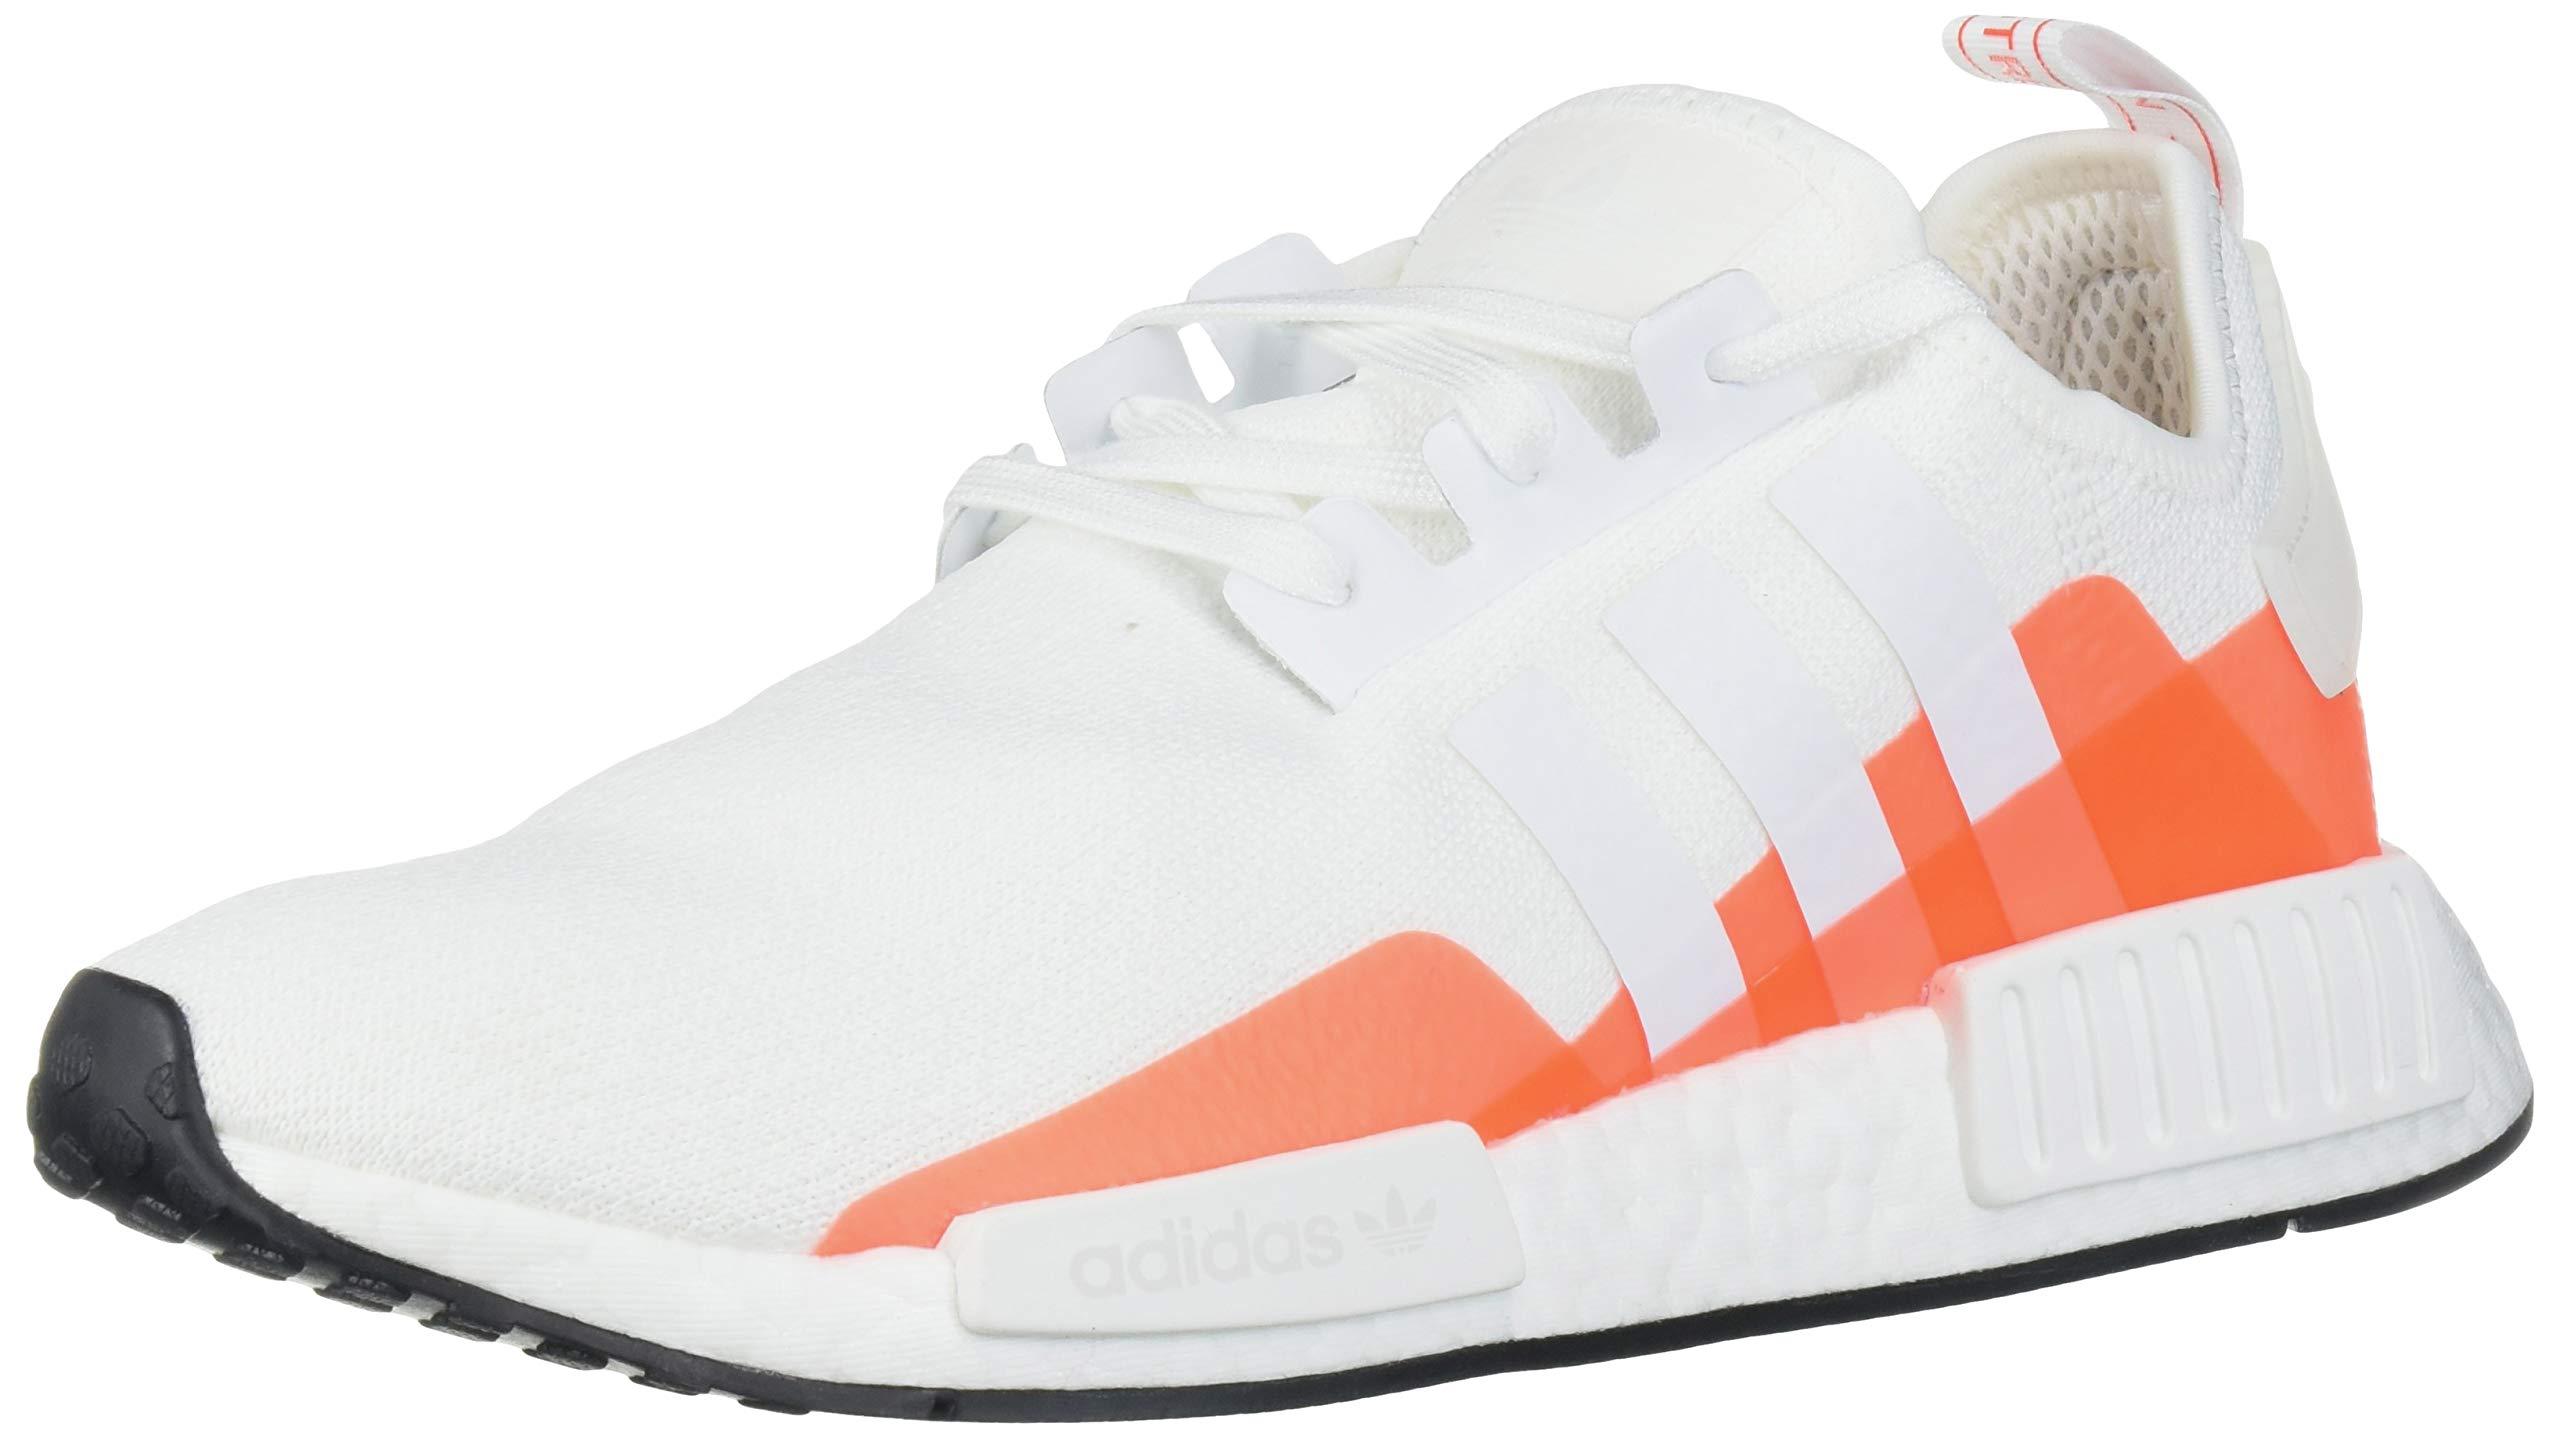 adidas Originals Men's NMD Hiking Shoe